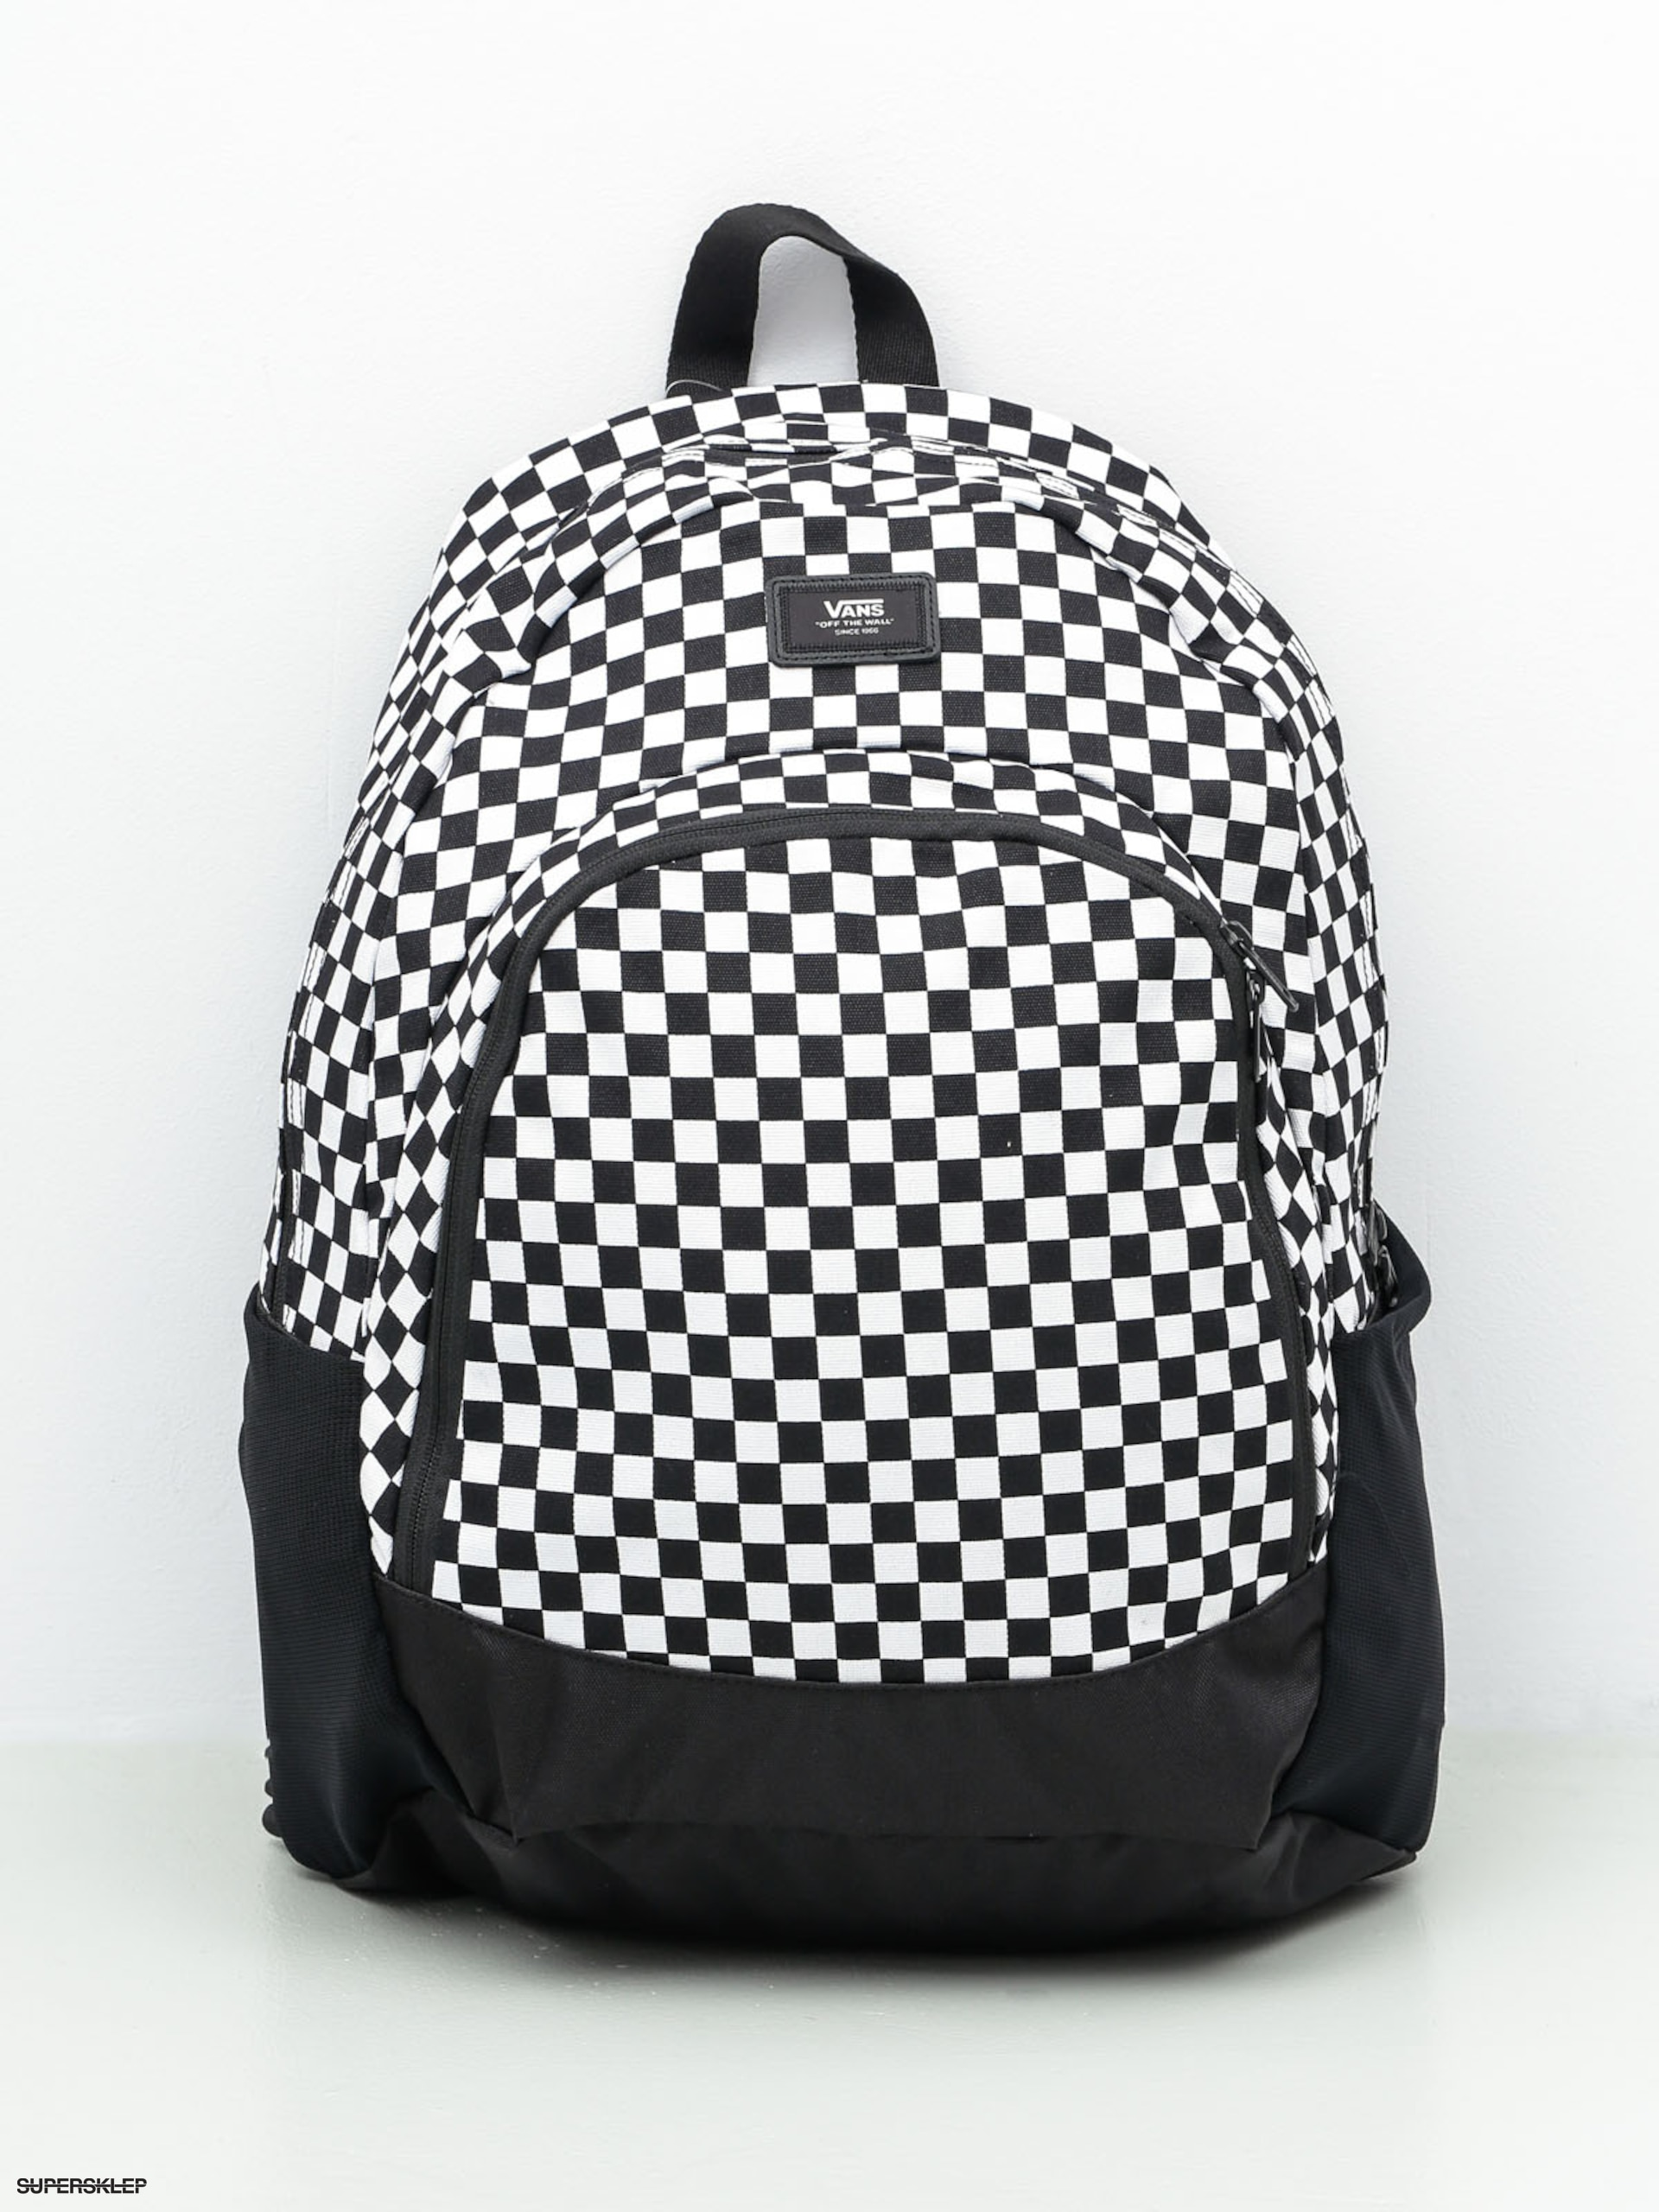 0431f1aaa4 Plecak Vans Van Doren (origina black white)